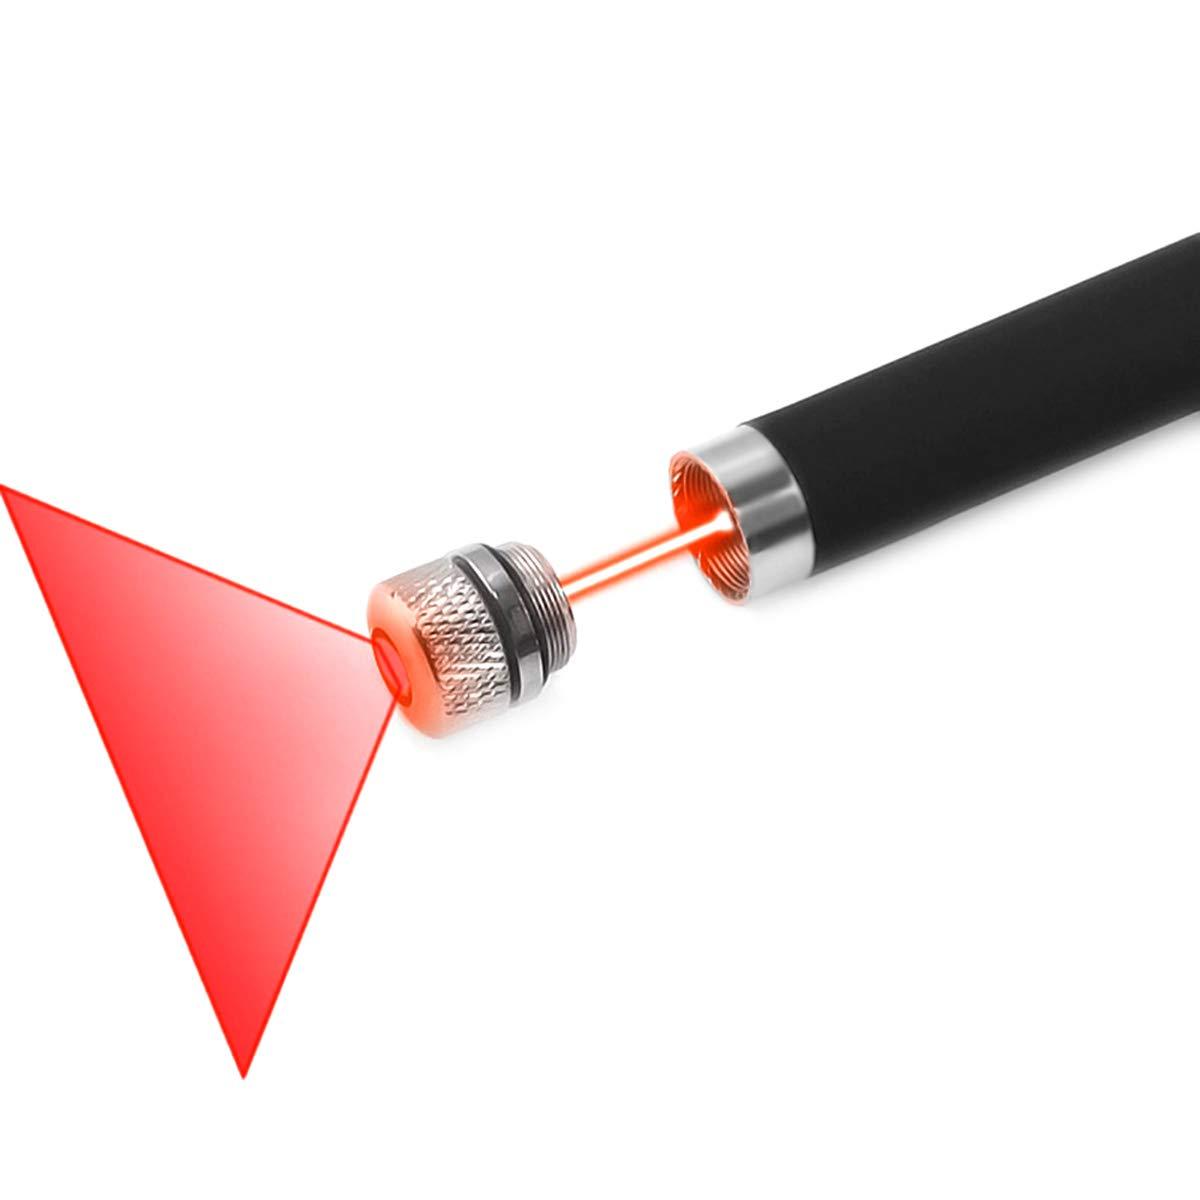 FreeMascot Green/Red Light Line Beam Presenter Pen (Black) (Red)